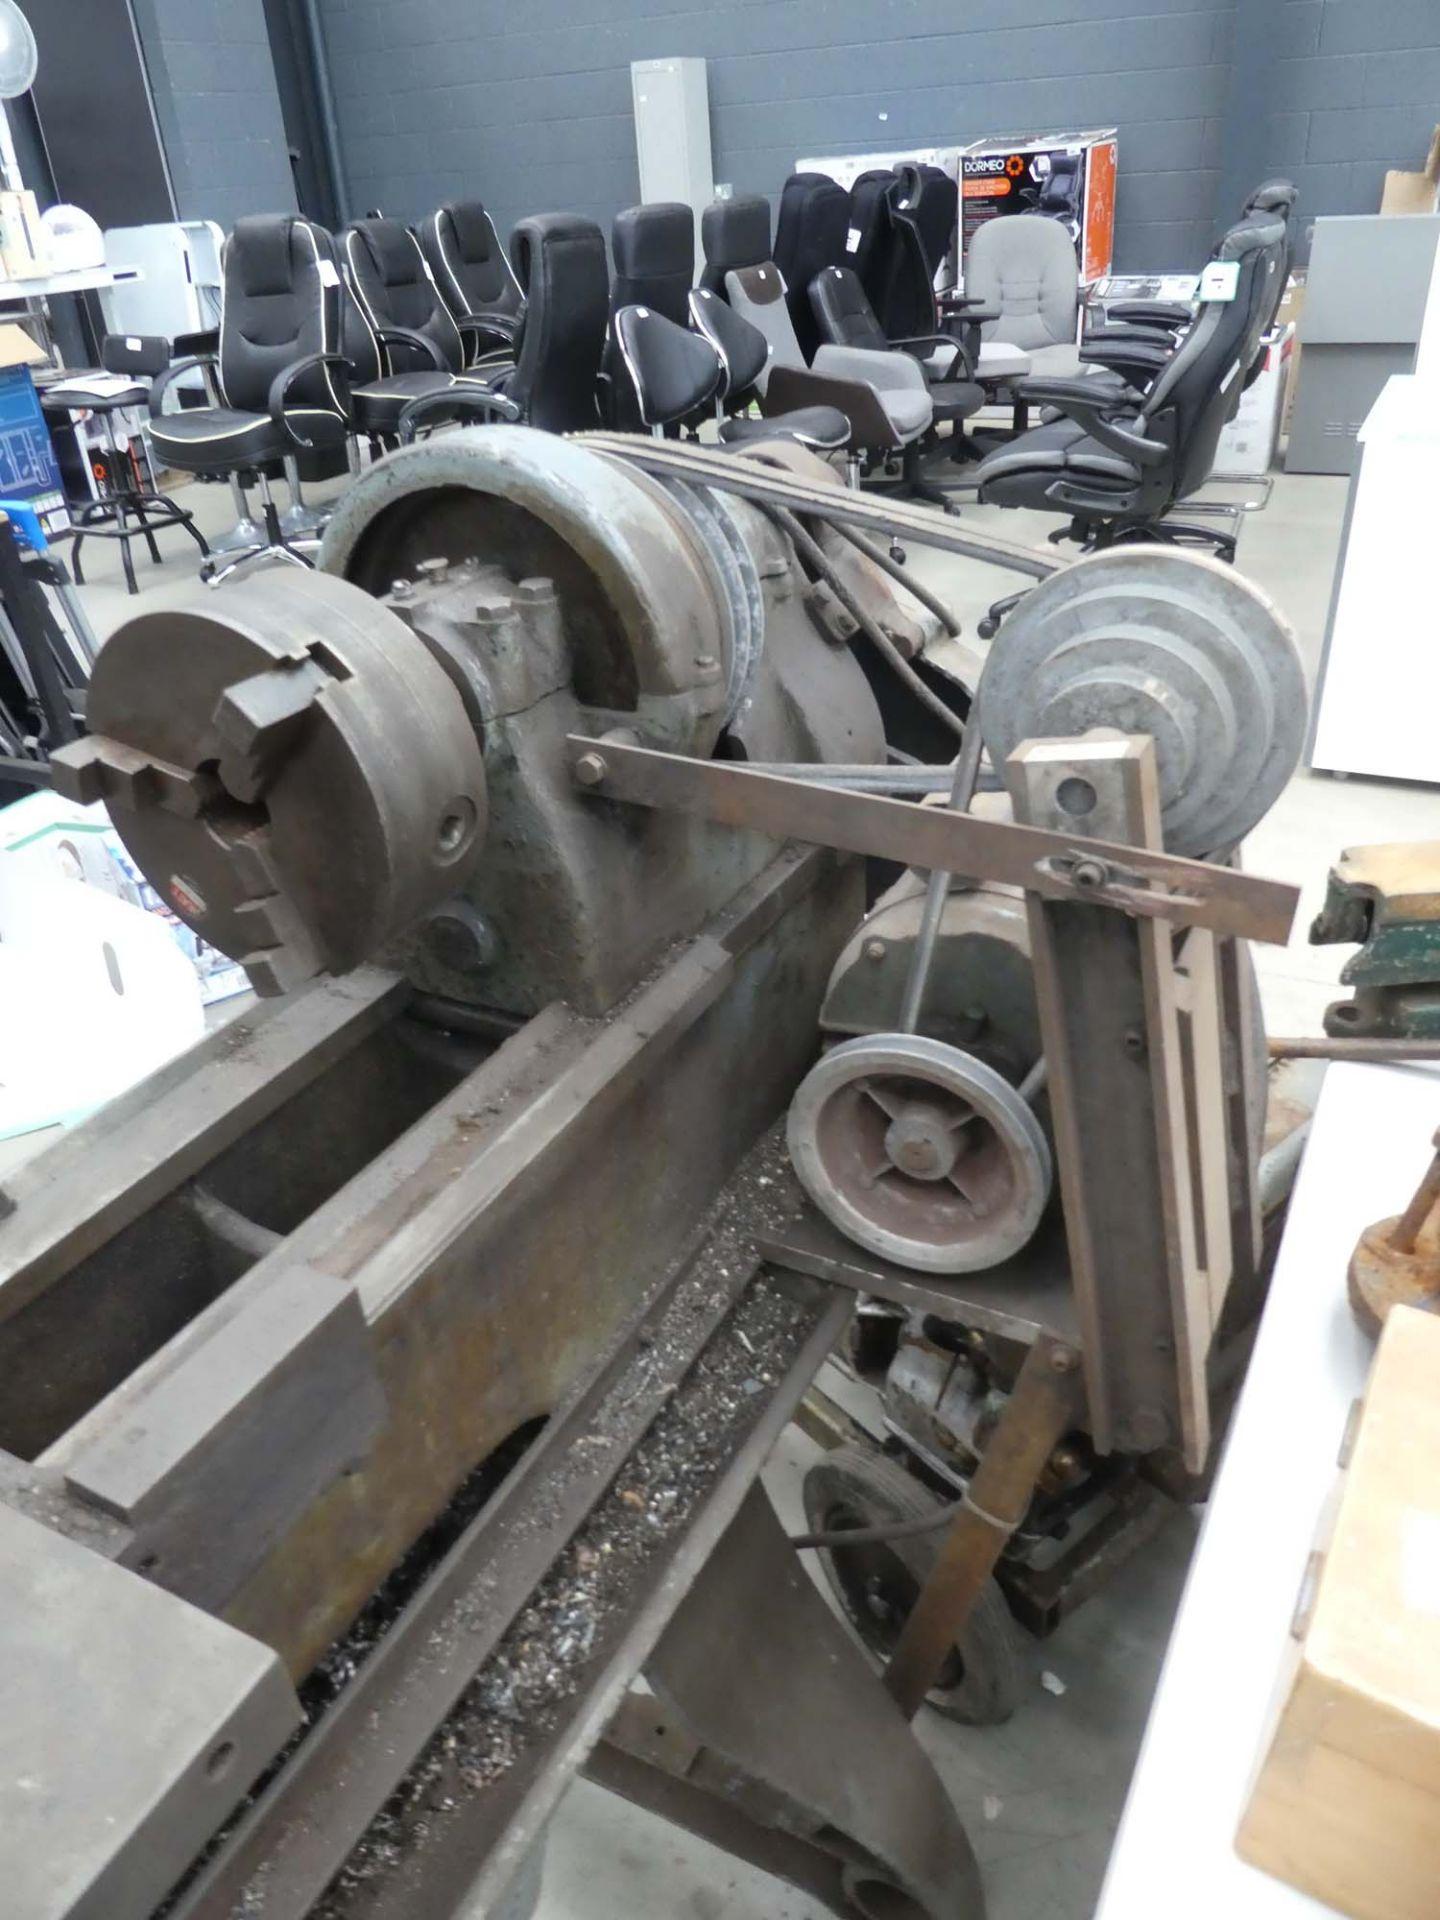 240V metal working lathe - Image 2 of 2